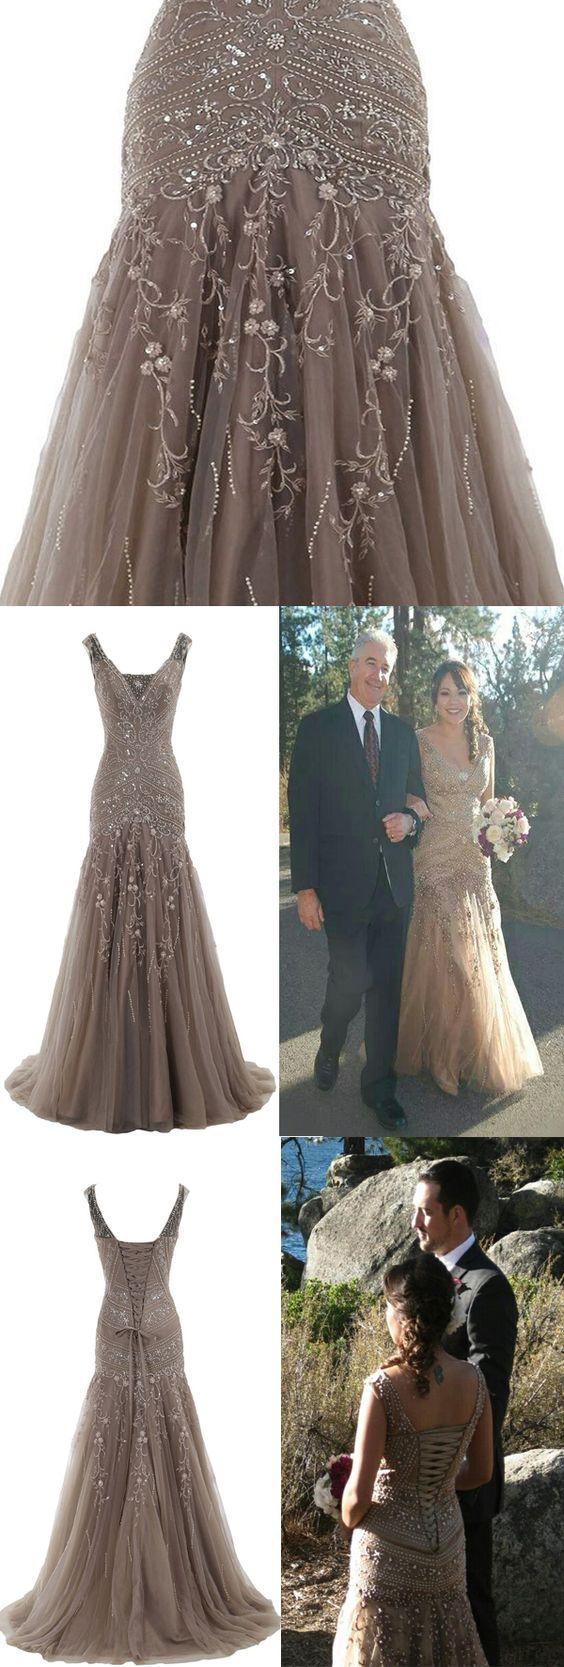 The dress images - Charming Prom Dress Beading Prom Dress Long Prom Dresses Evening Dress From Olesa Wedding Shop